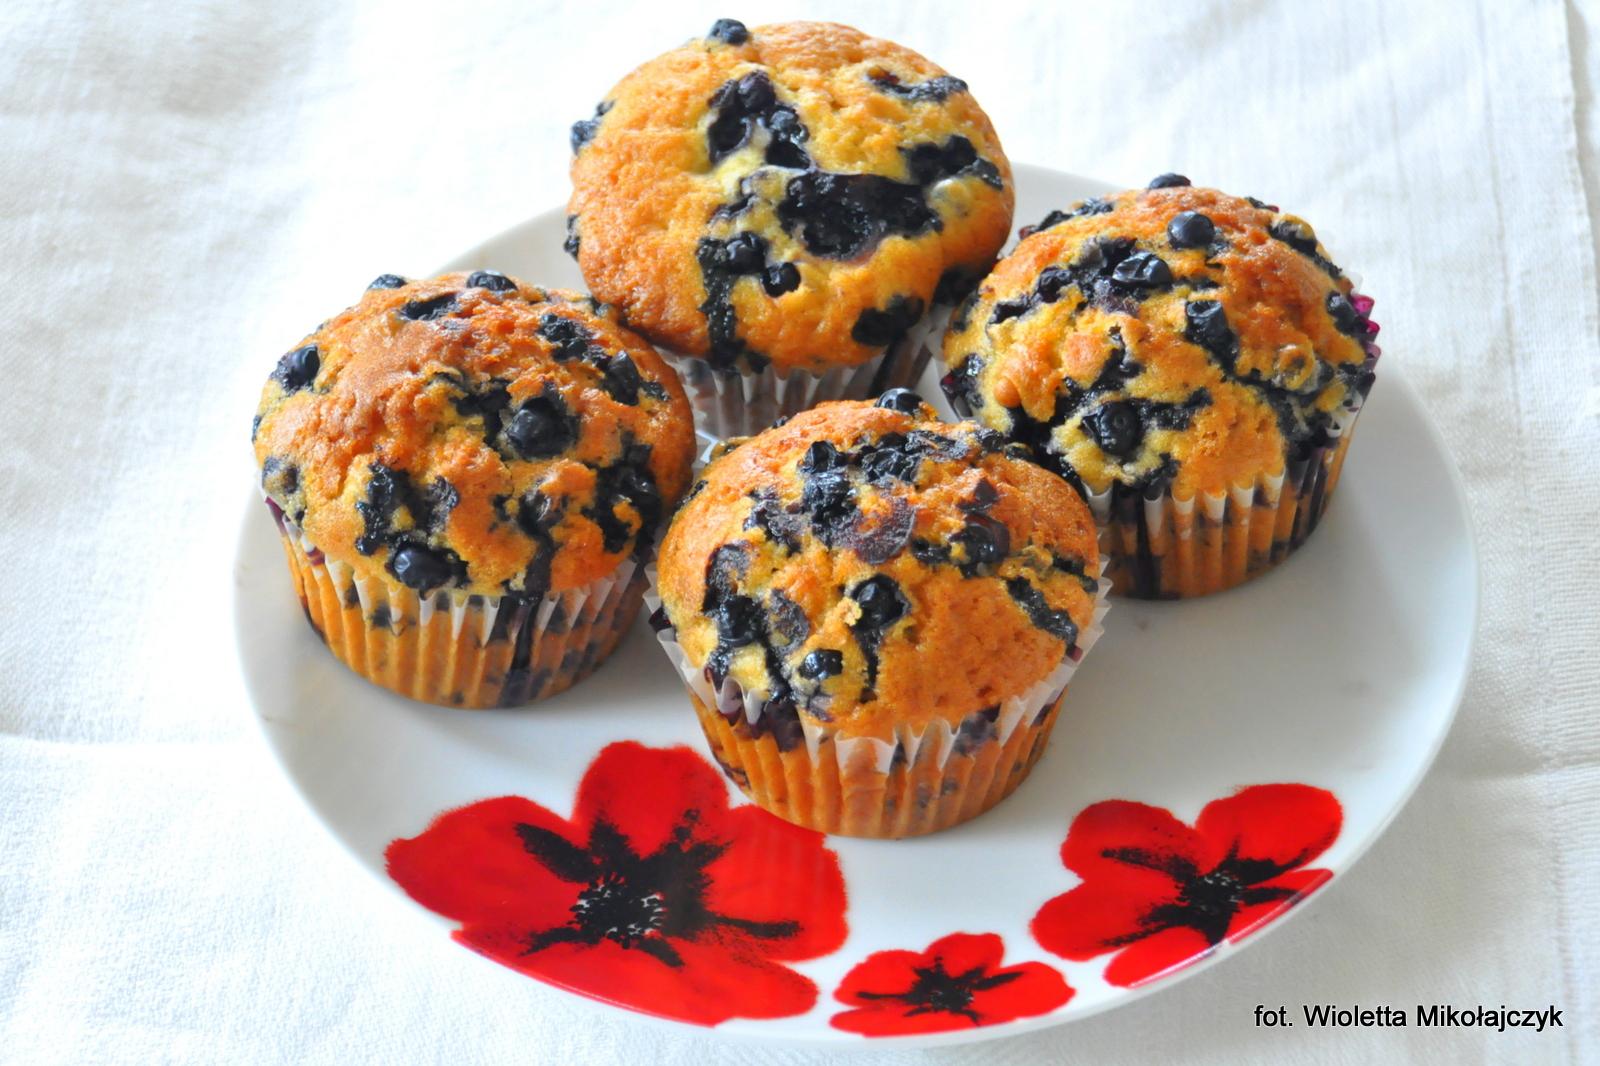 Mocno jagodowe muffiny -> owocowe pieguski.